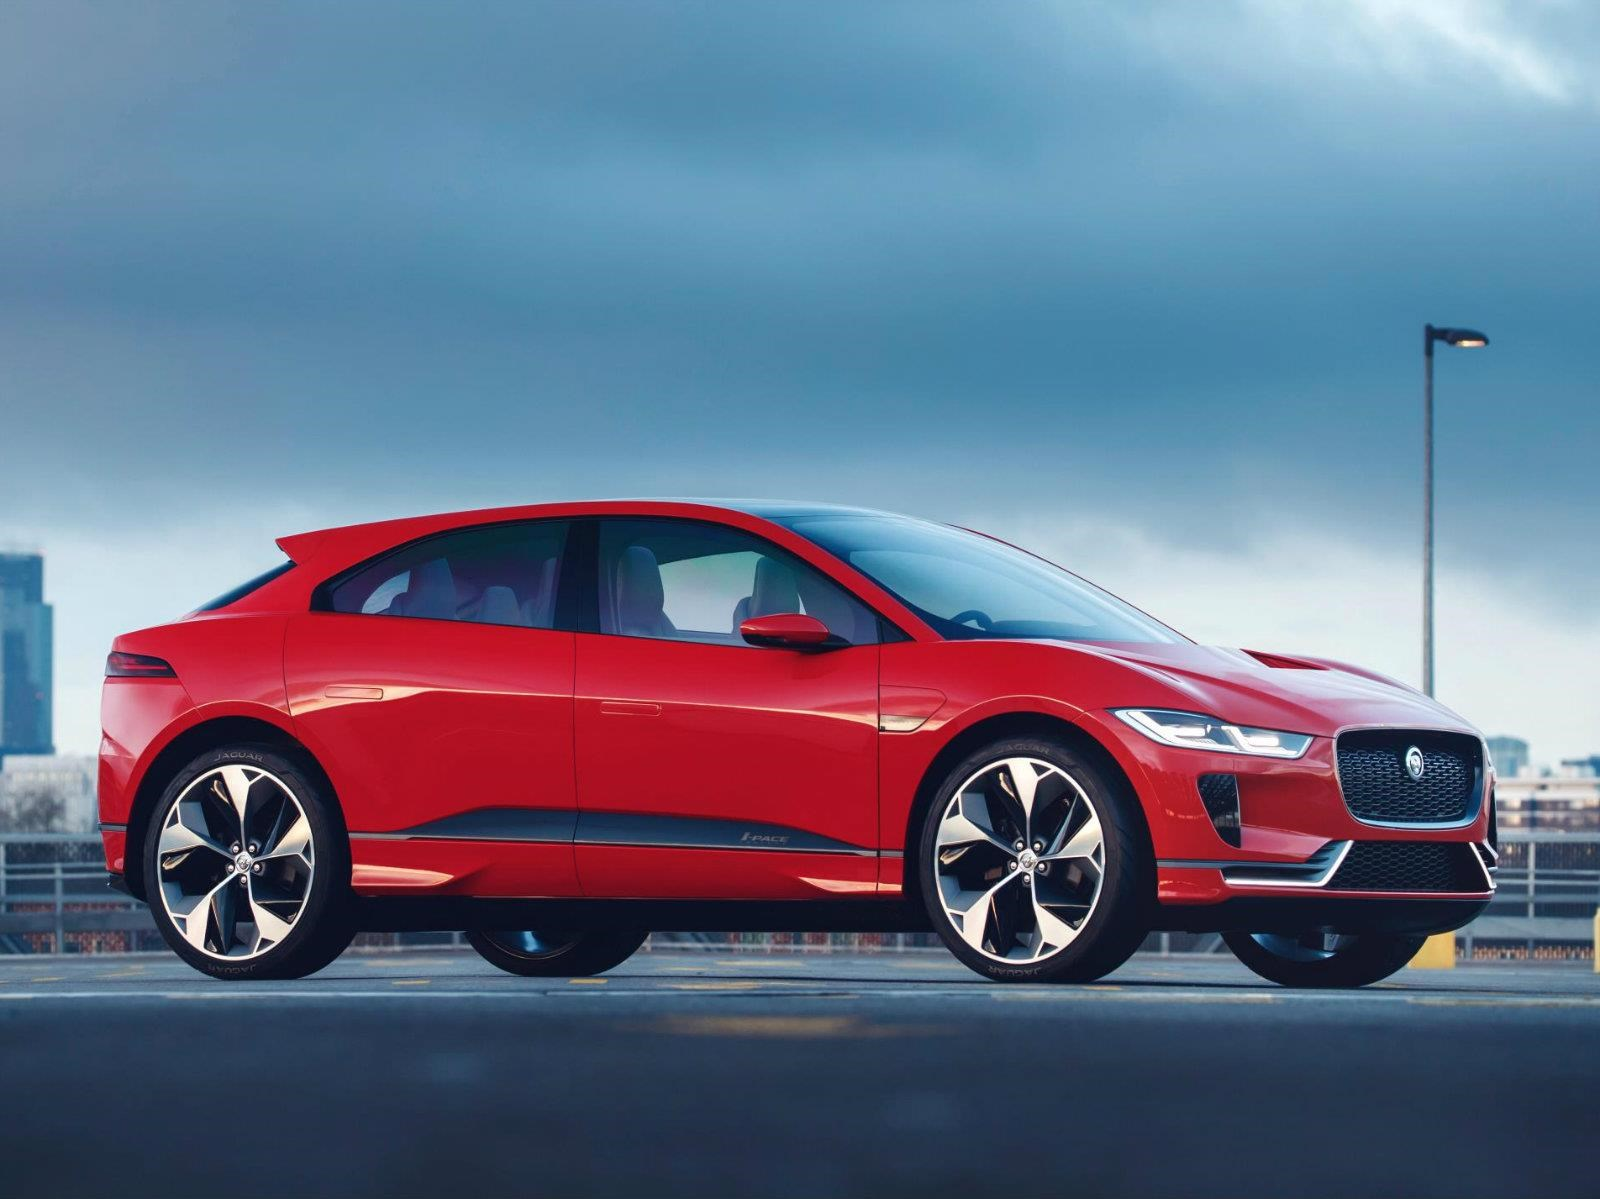 Jaguar I-Pace Concept es el mejor auto concepto de 2017